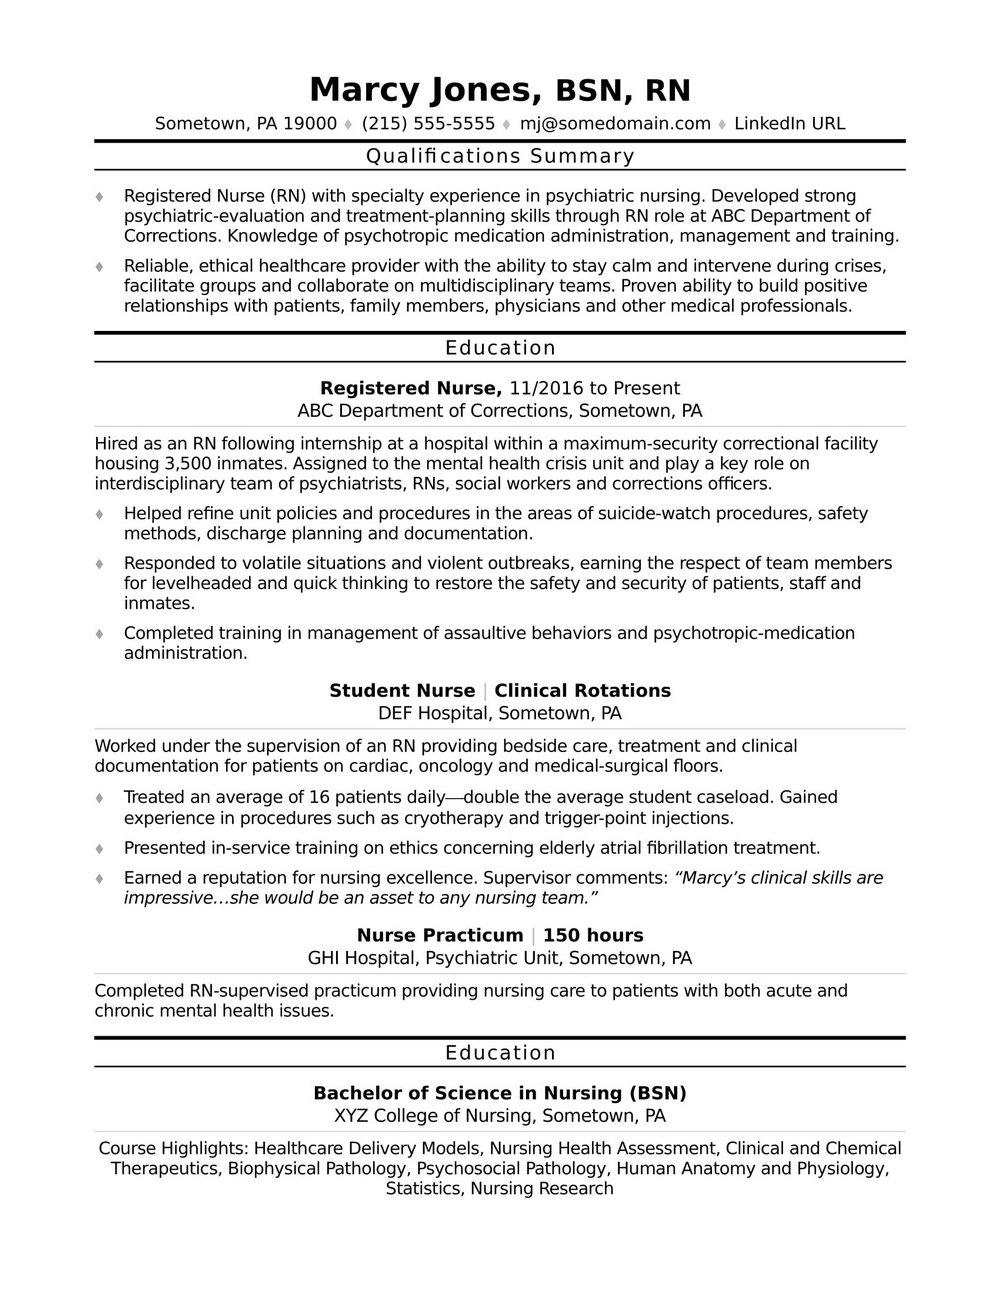 Registered Nurse Resume Template Word 2007